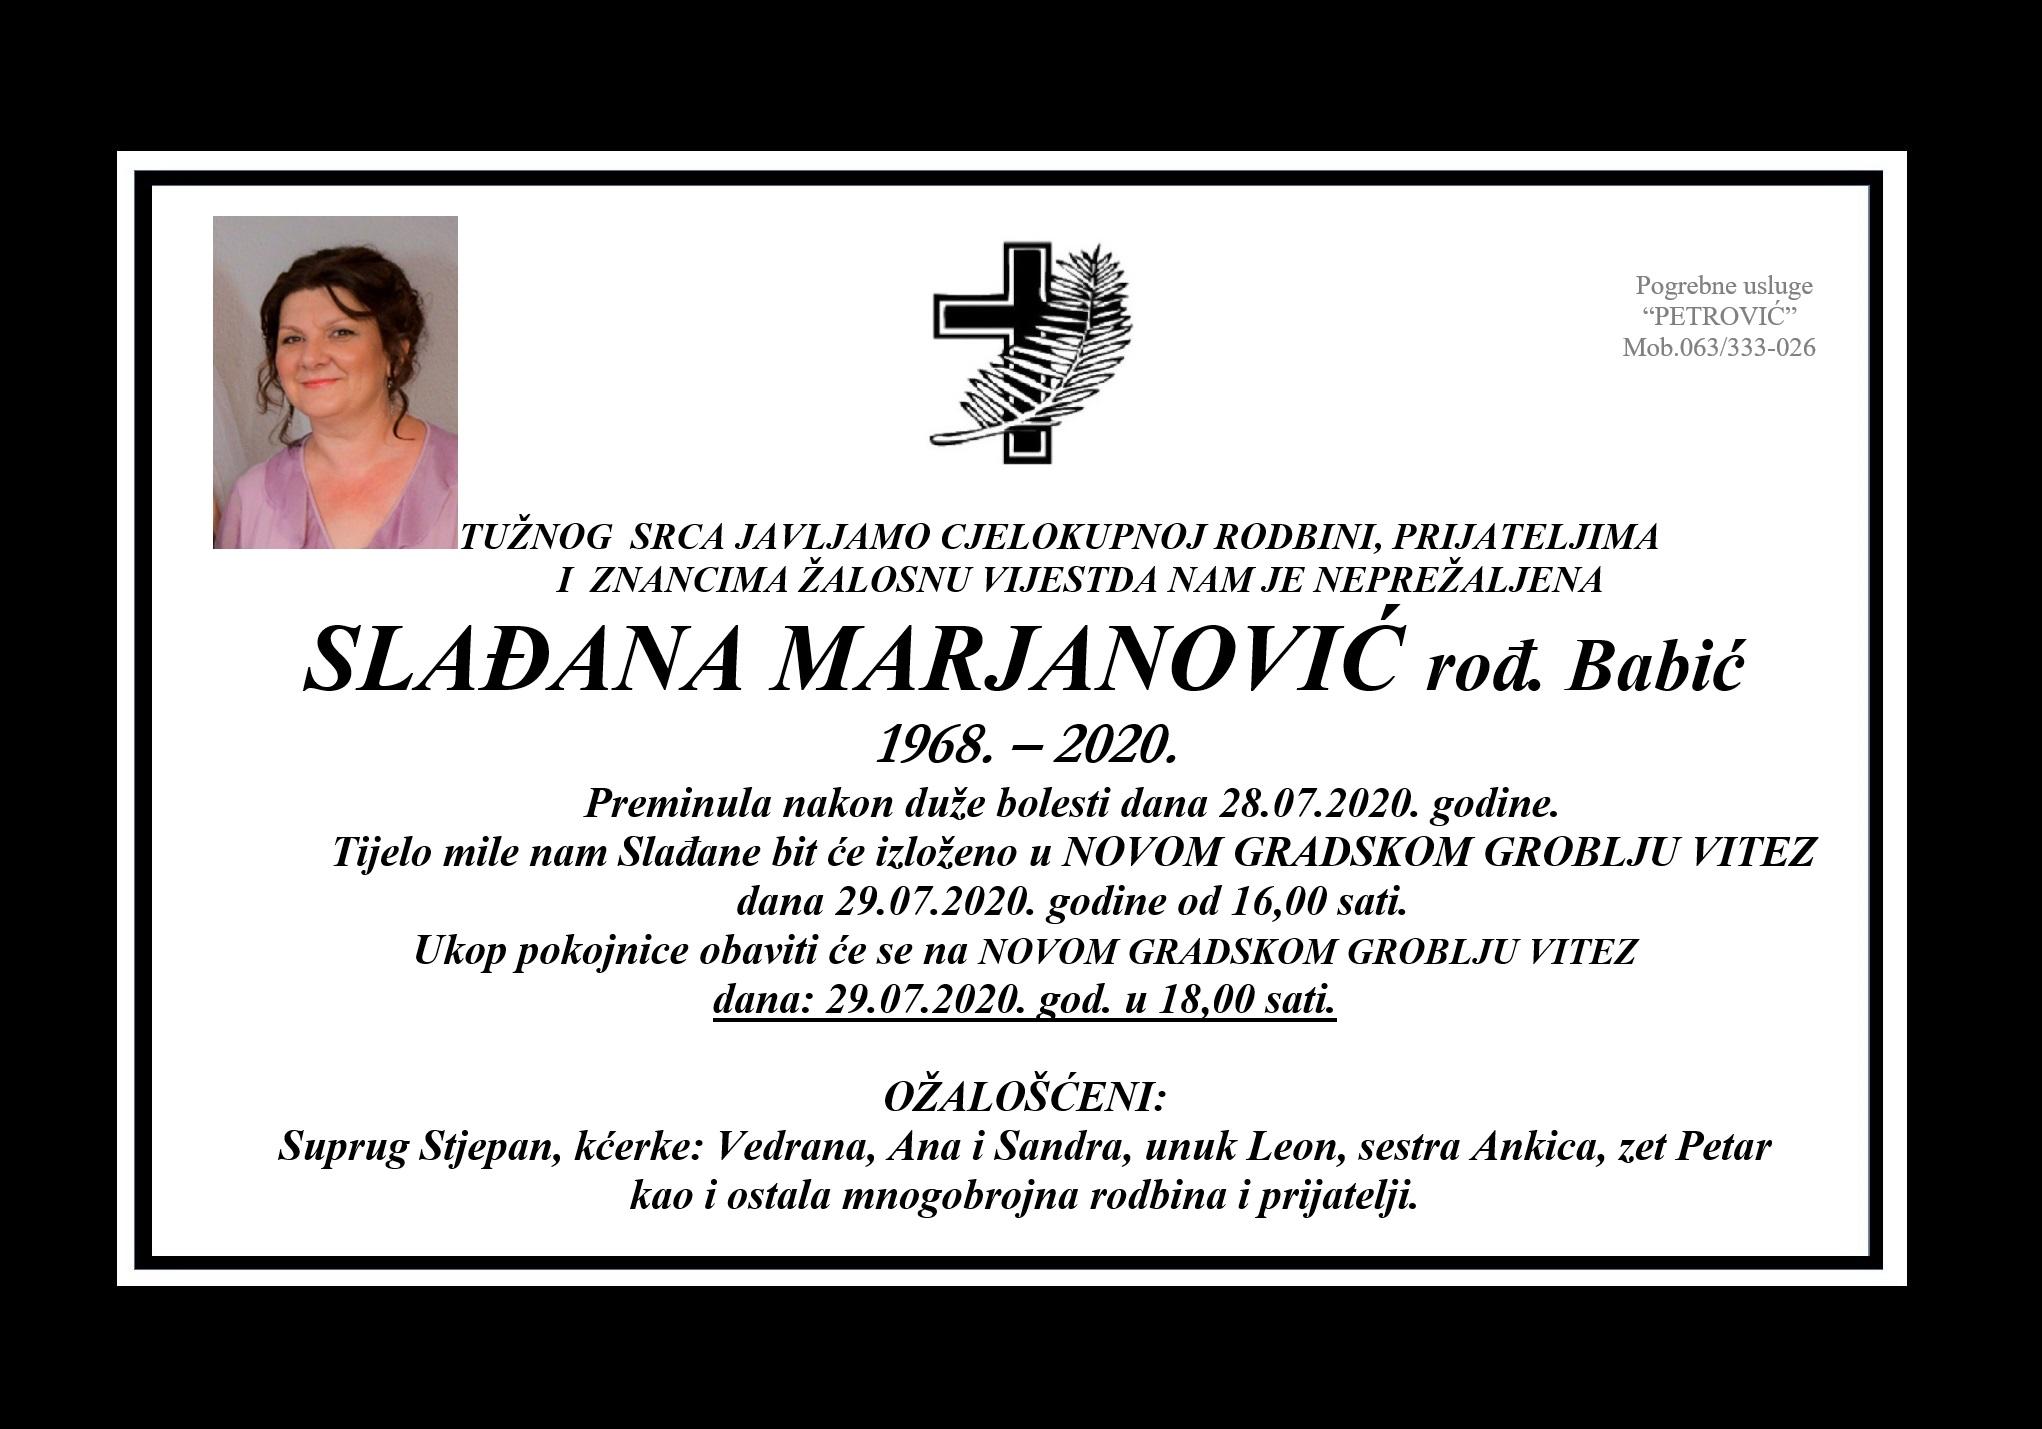 Slađana Marjanović rođ. Babić